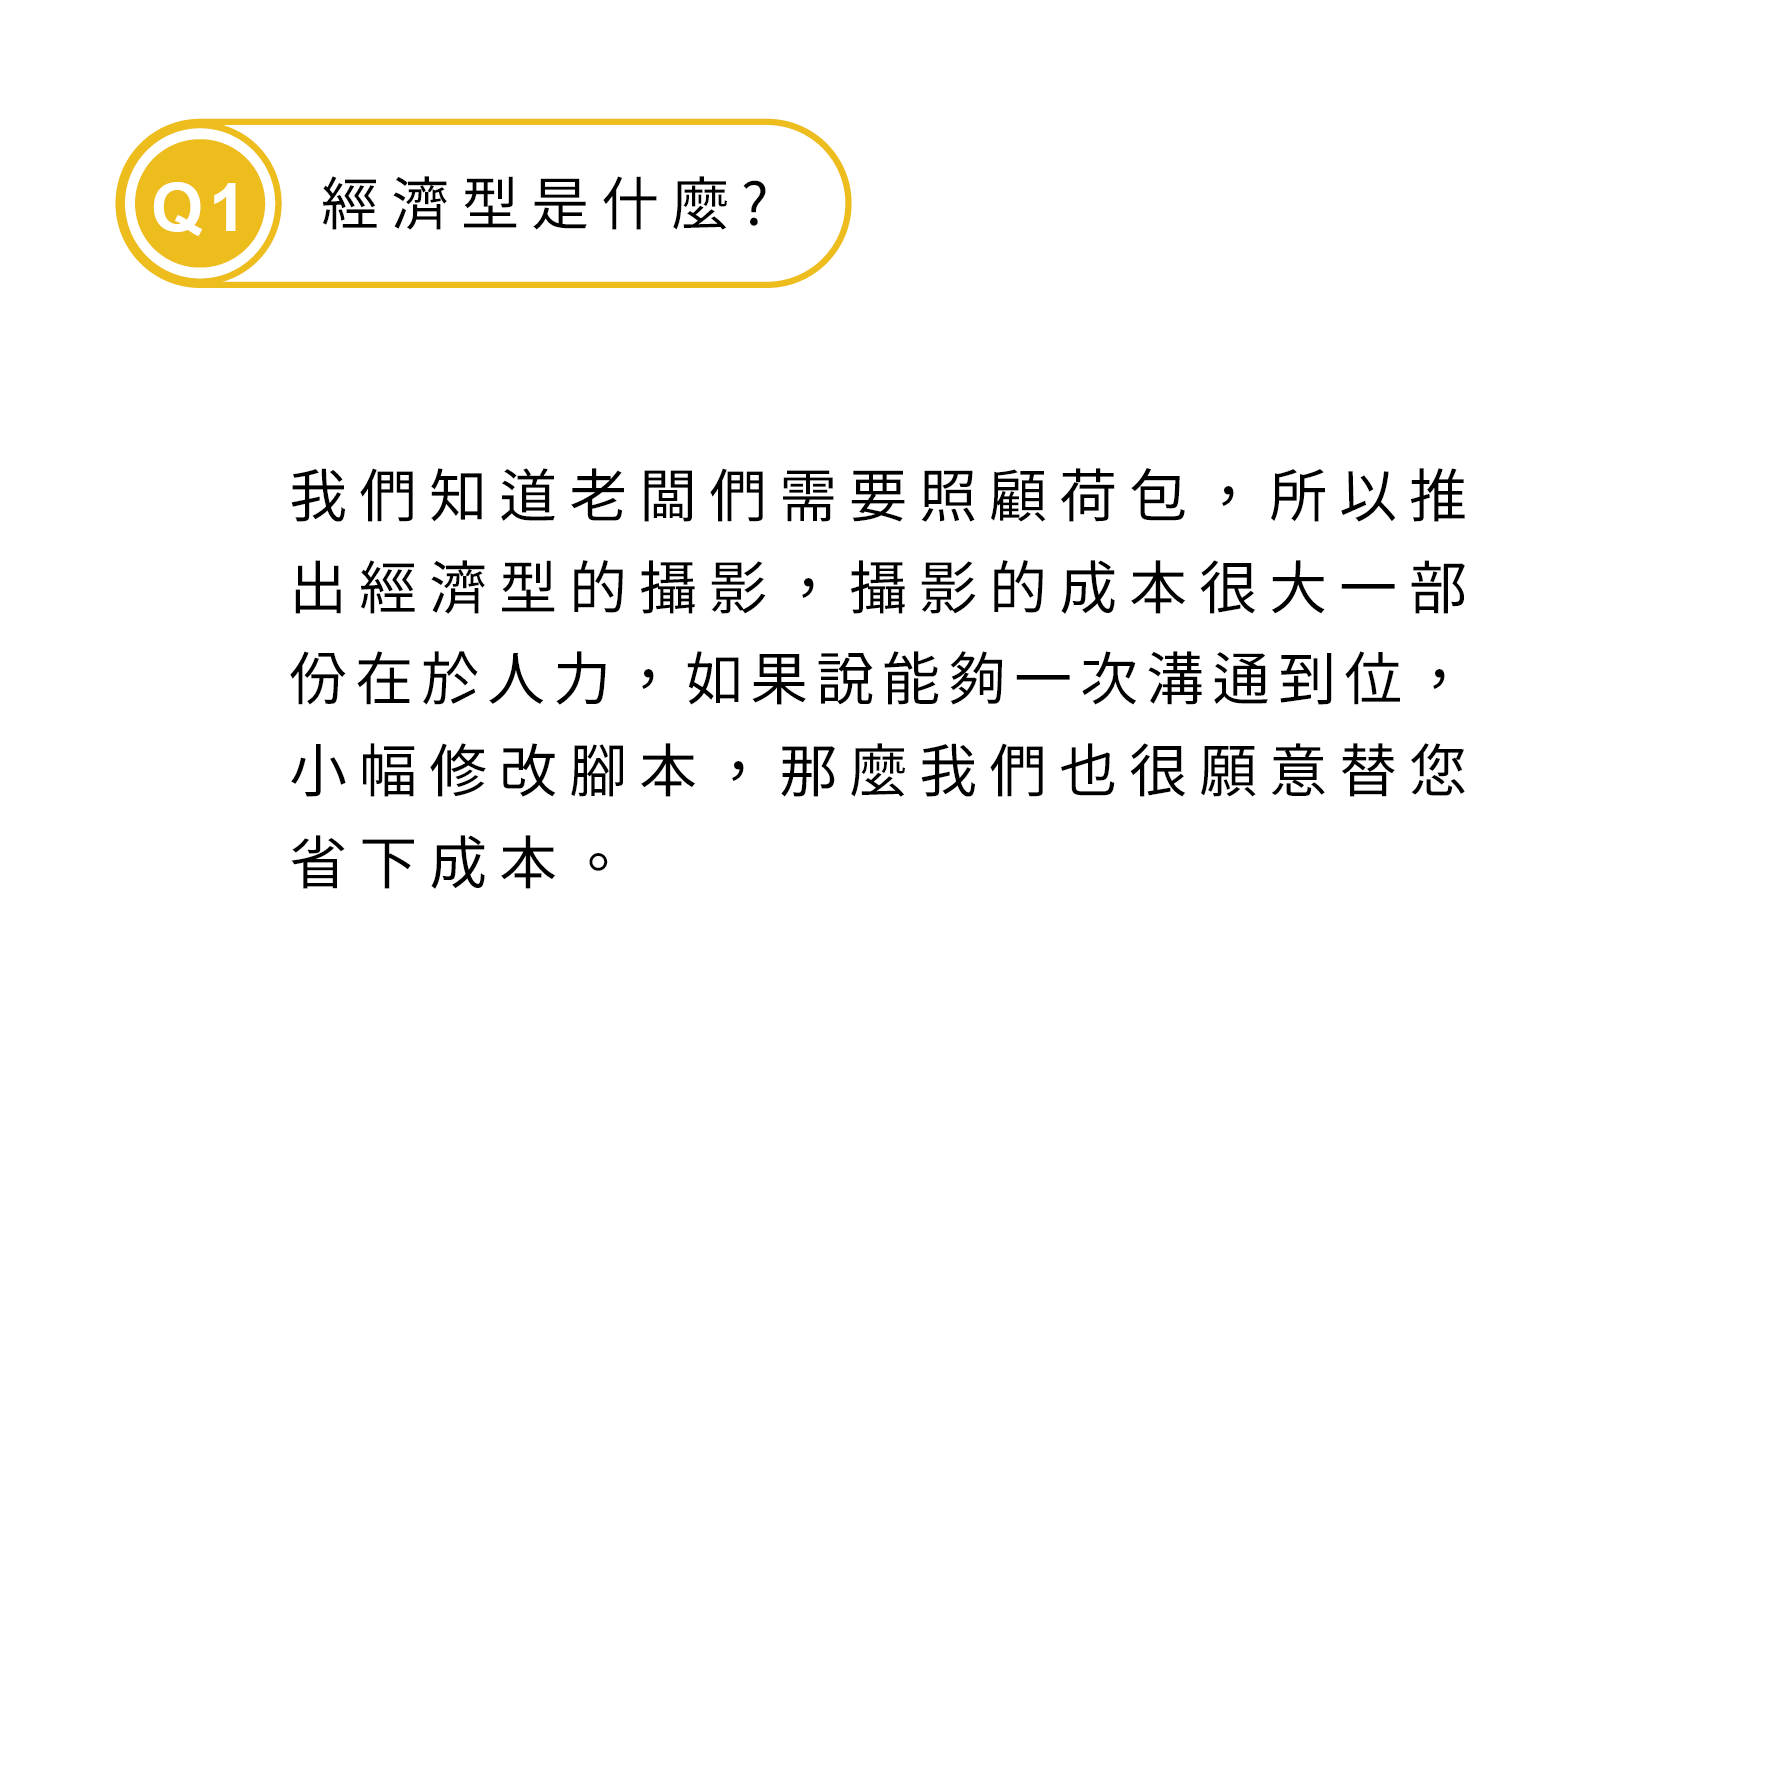 Q1 (1)